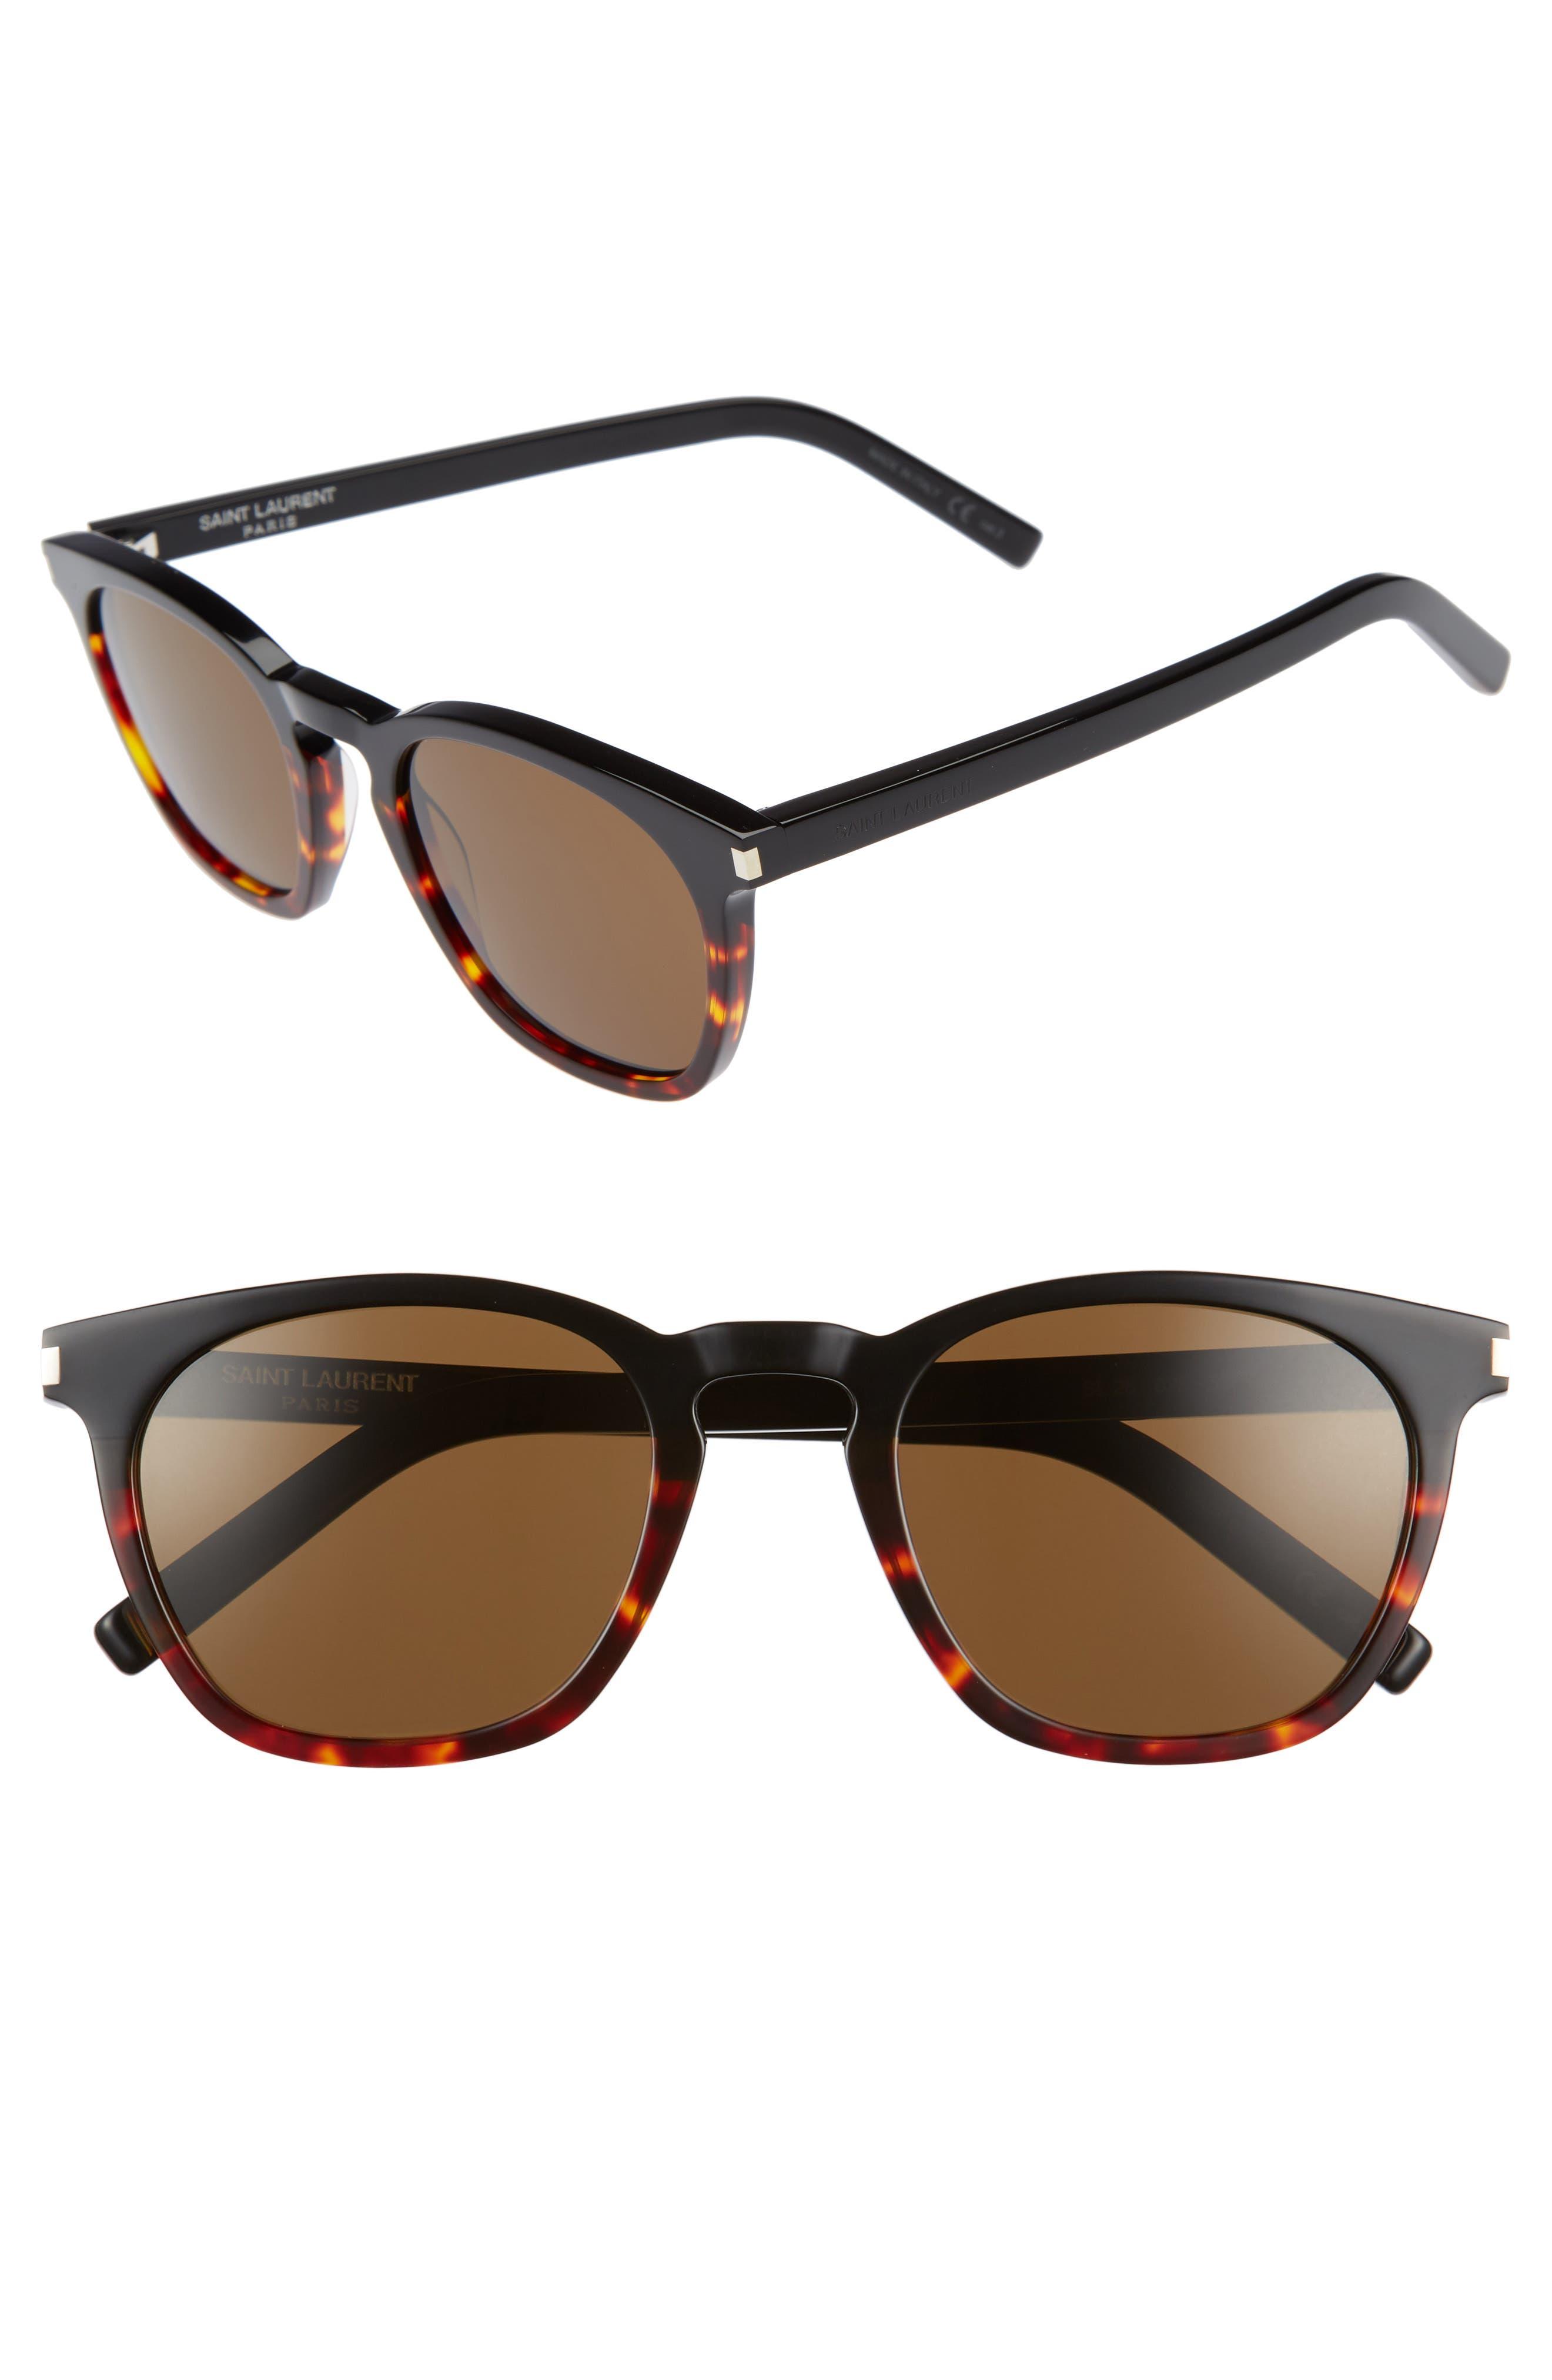 Main Image - Saint Laurent SL 28 51mm Keyhole Sunglasses